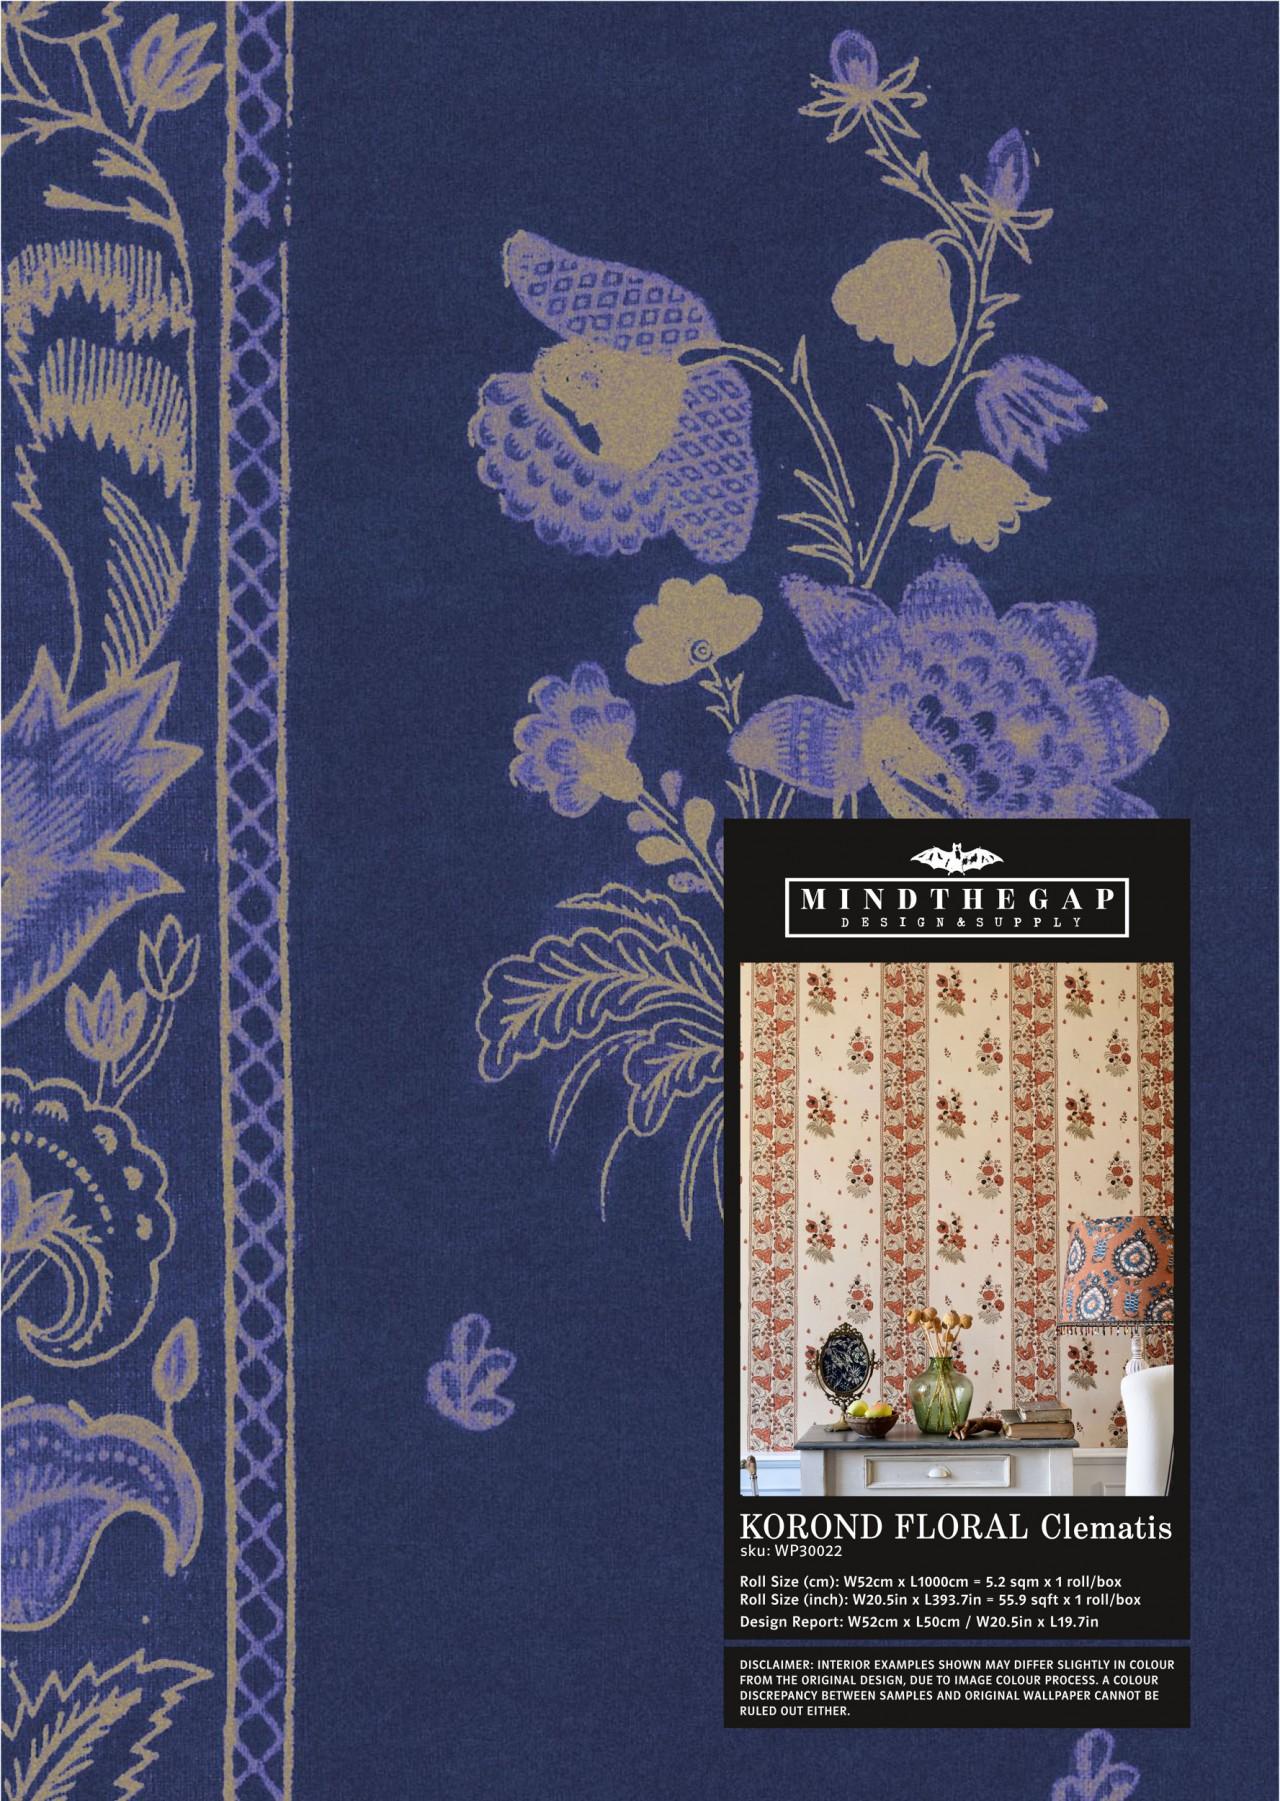 KOROND FLORAL Clematis Wallpaper Sample